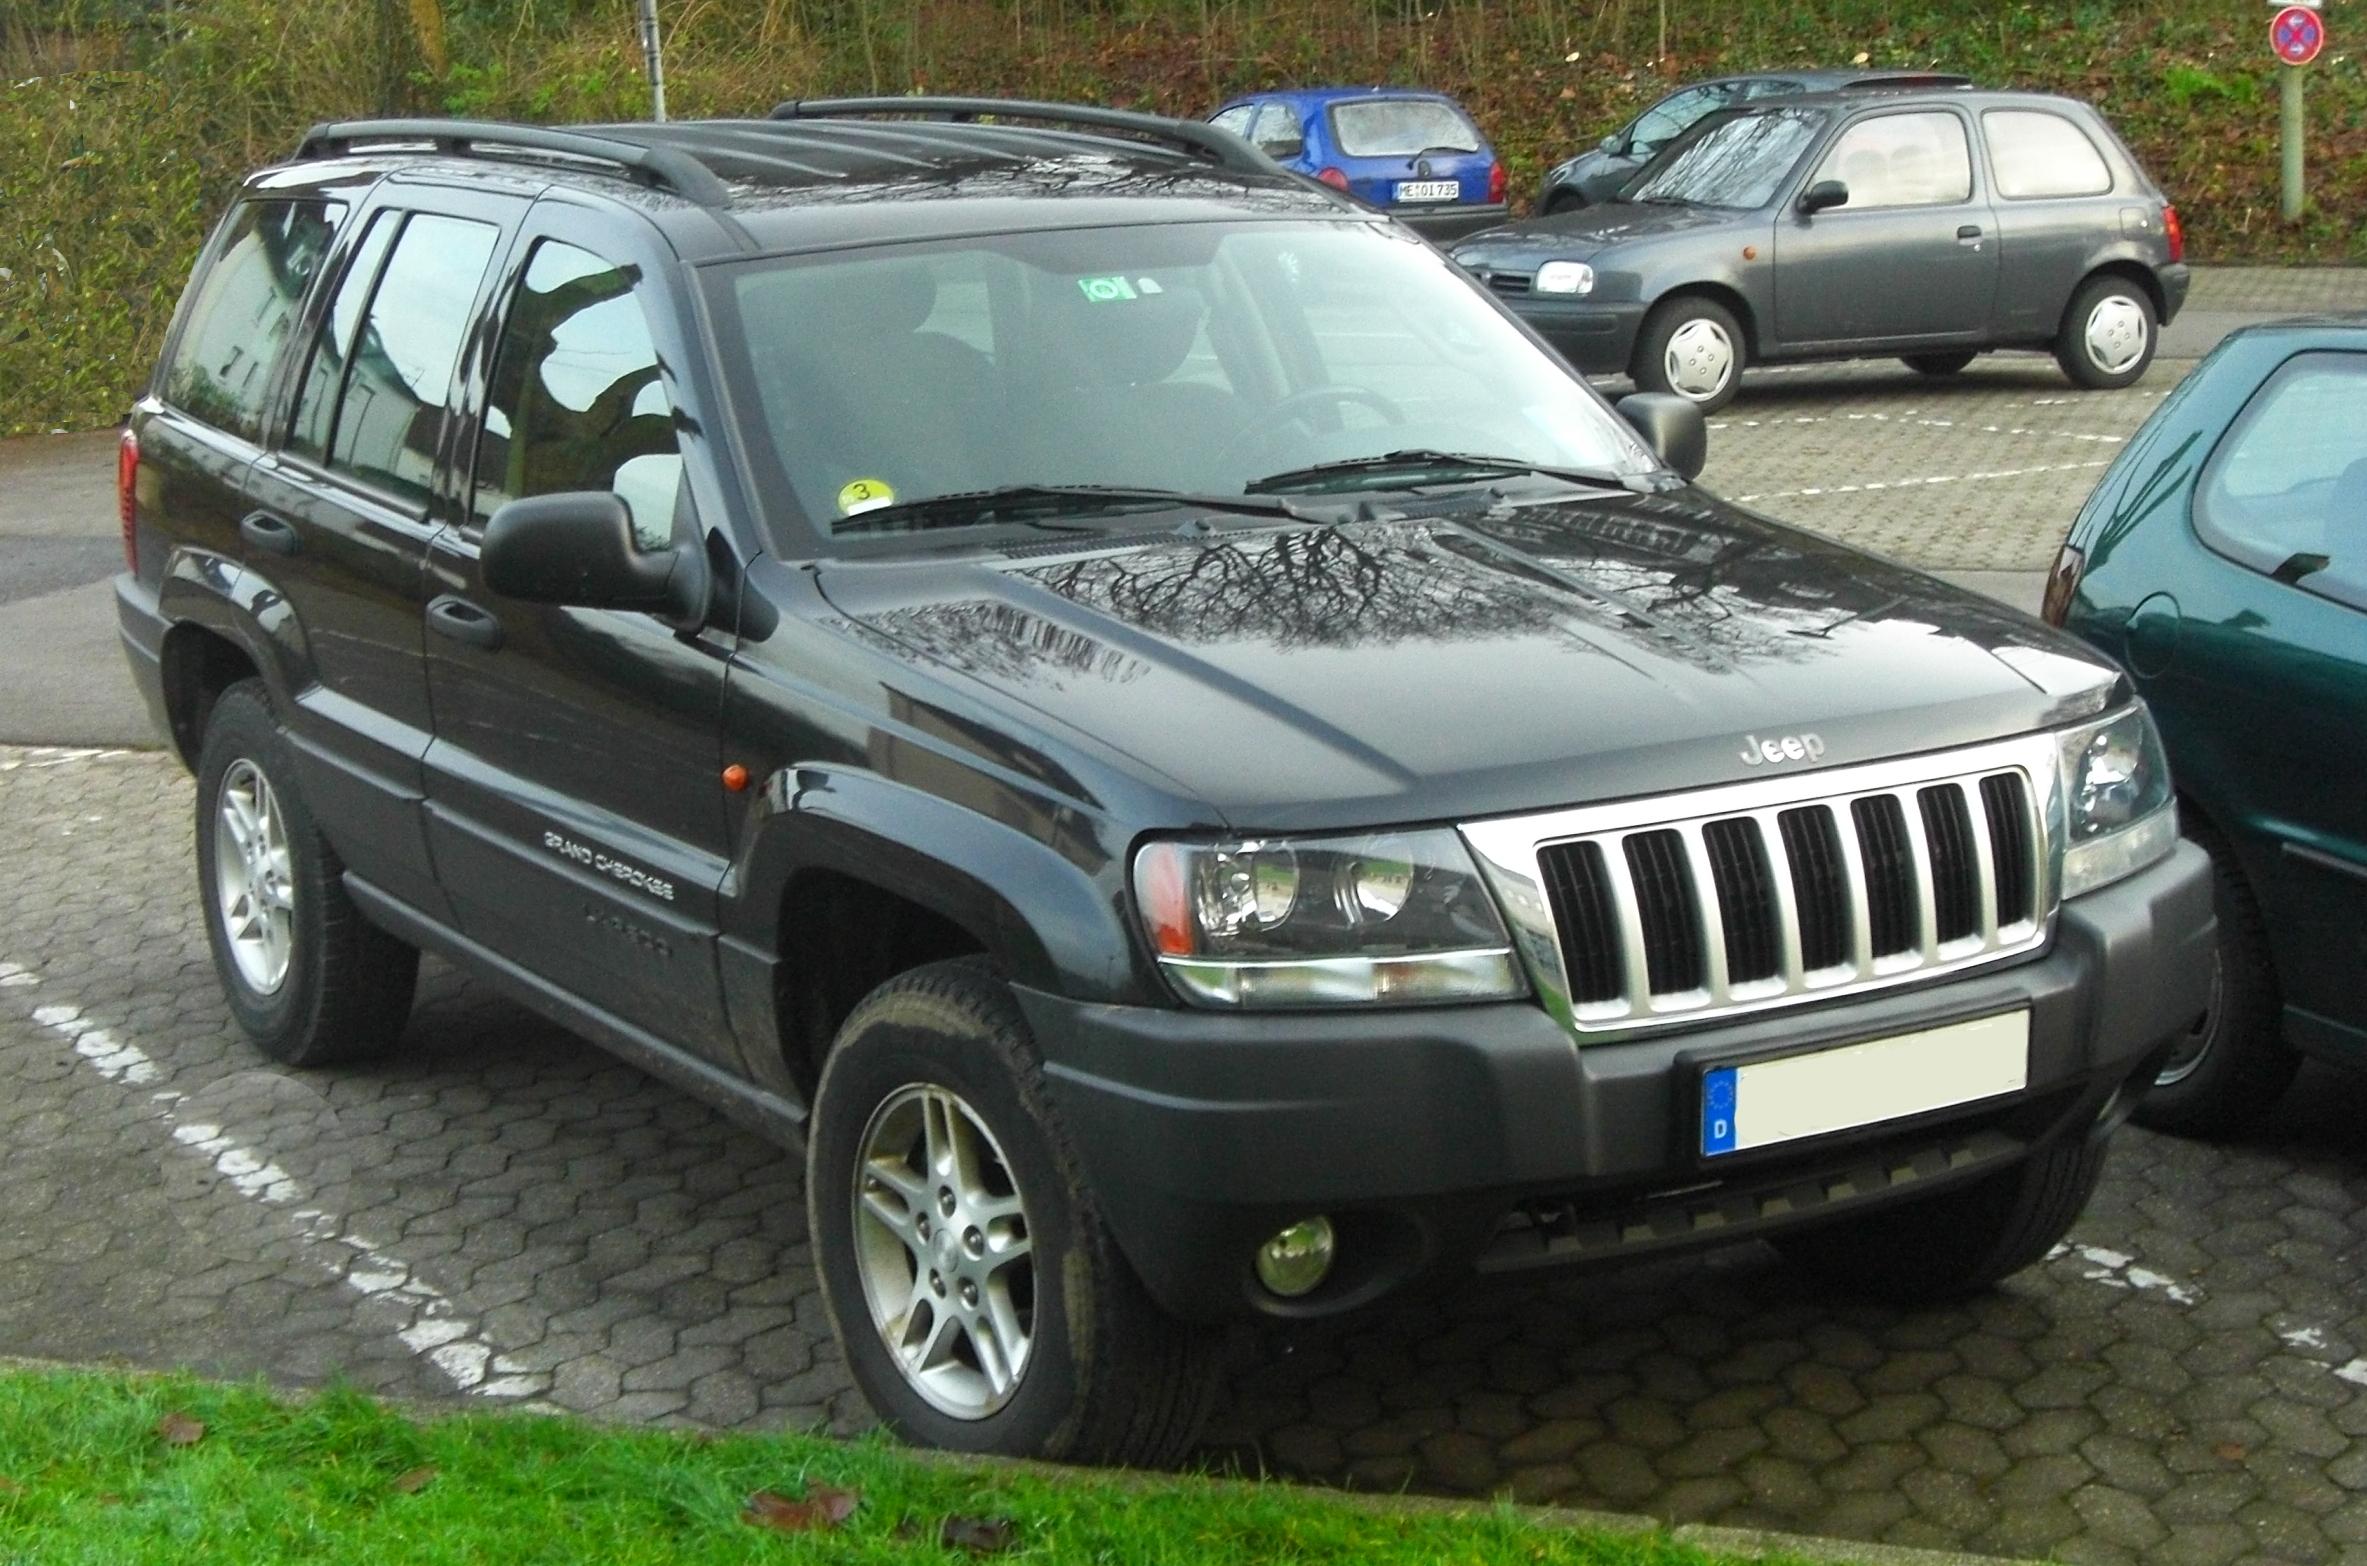 jeep grand cherokee ii laredo facelift 2004 front mj jpg wikipedia. Black Bedroom Furniture Sets. Home Design Ideas